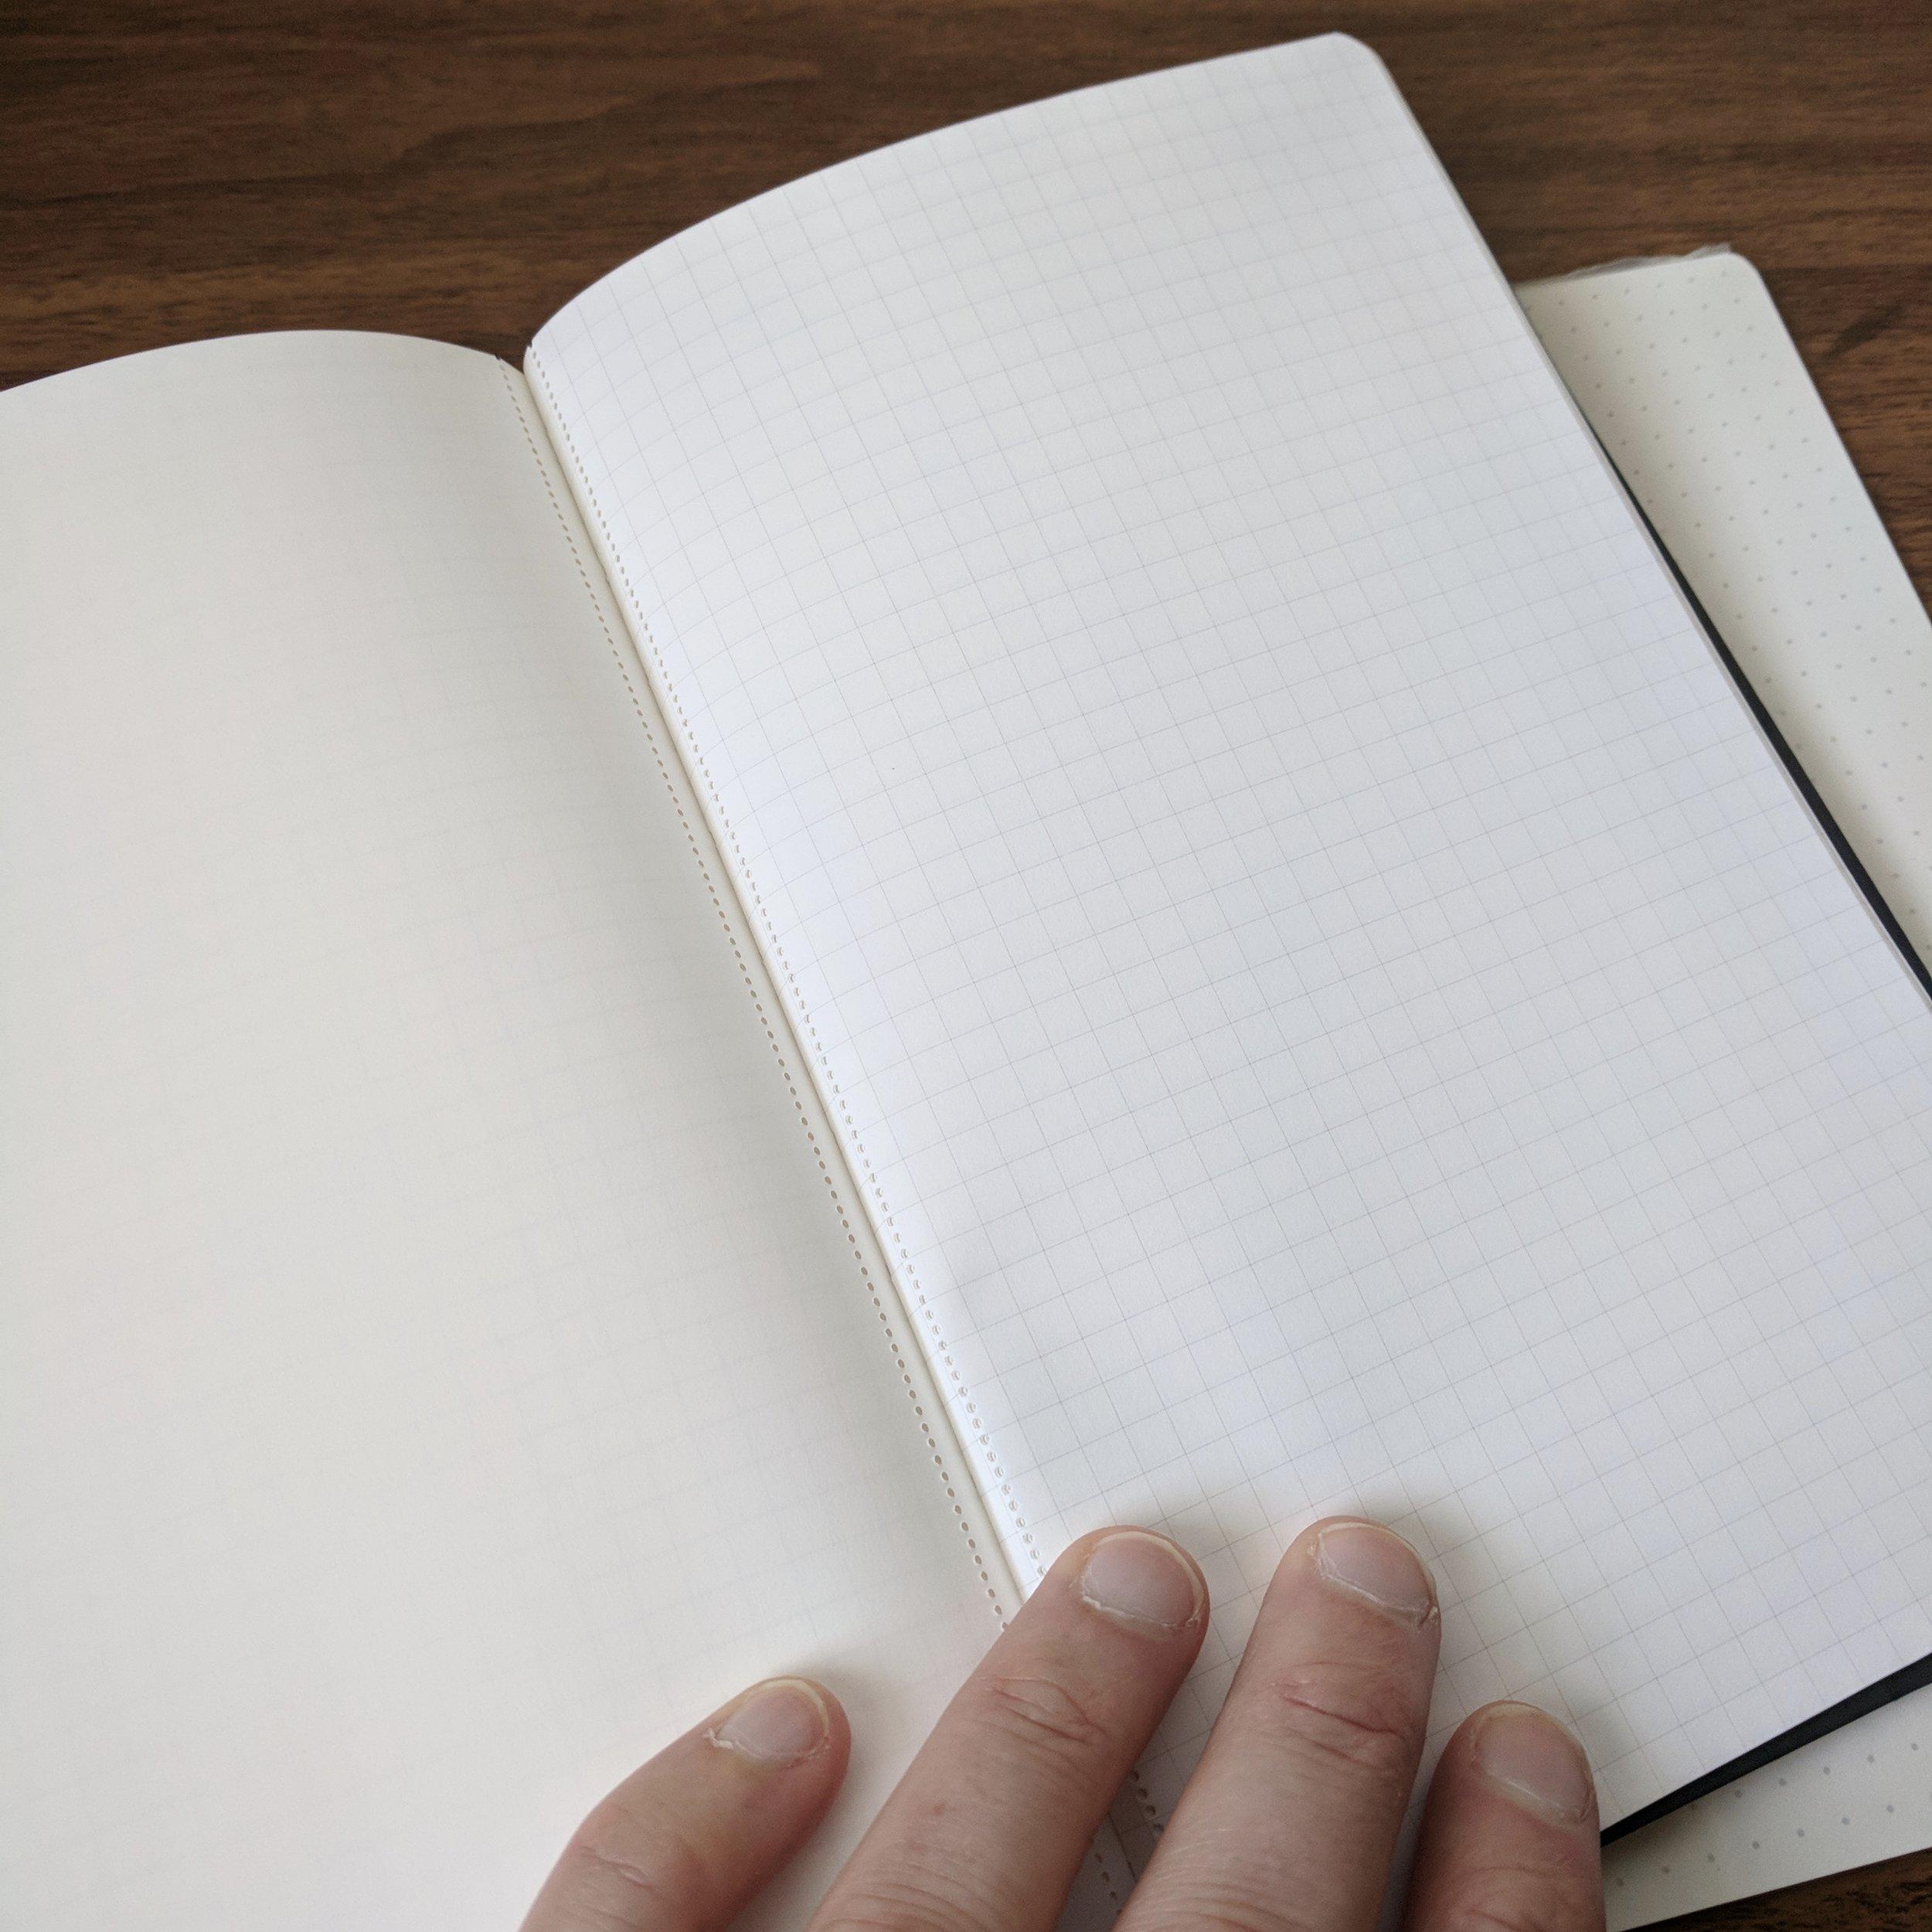 Stifflexible Lined Paper